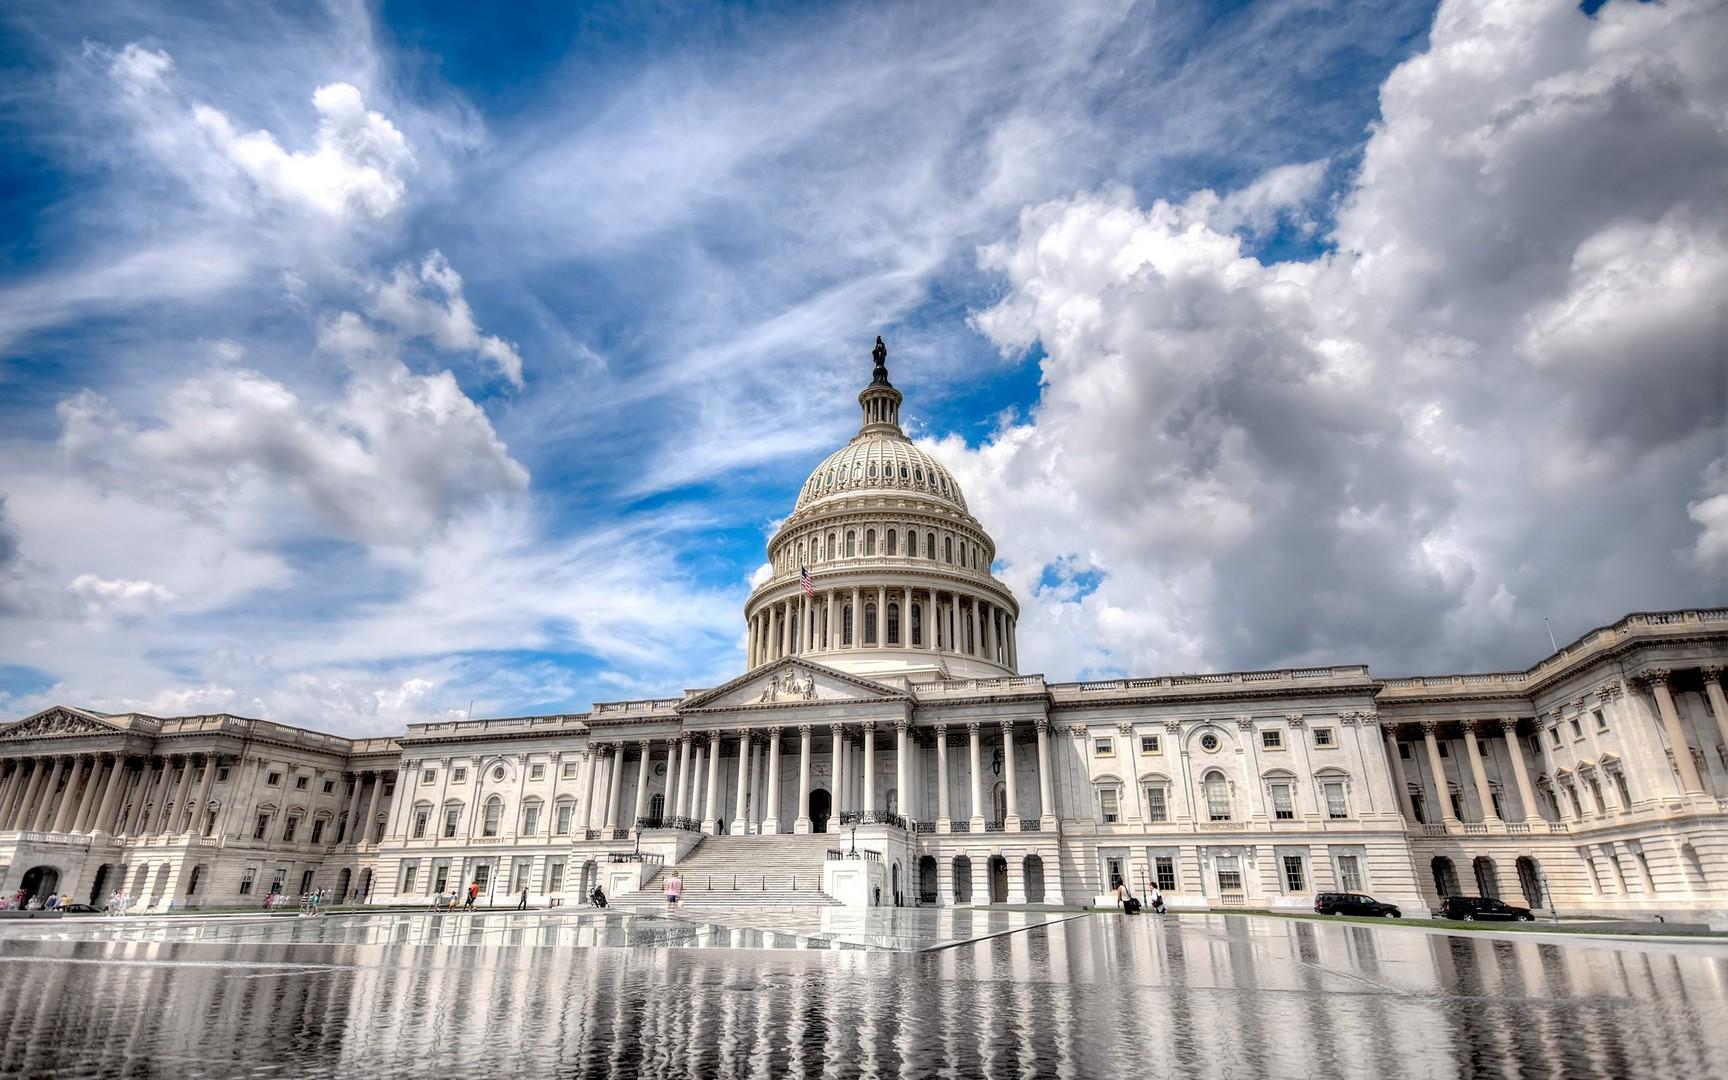 United States Capitol Wallpaper 3   1728 X 1080 stmednet 1728x1080